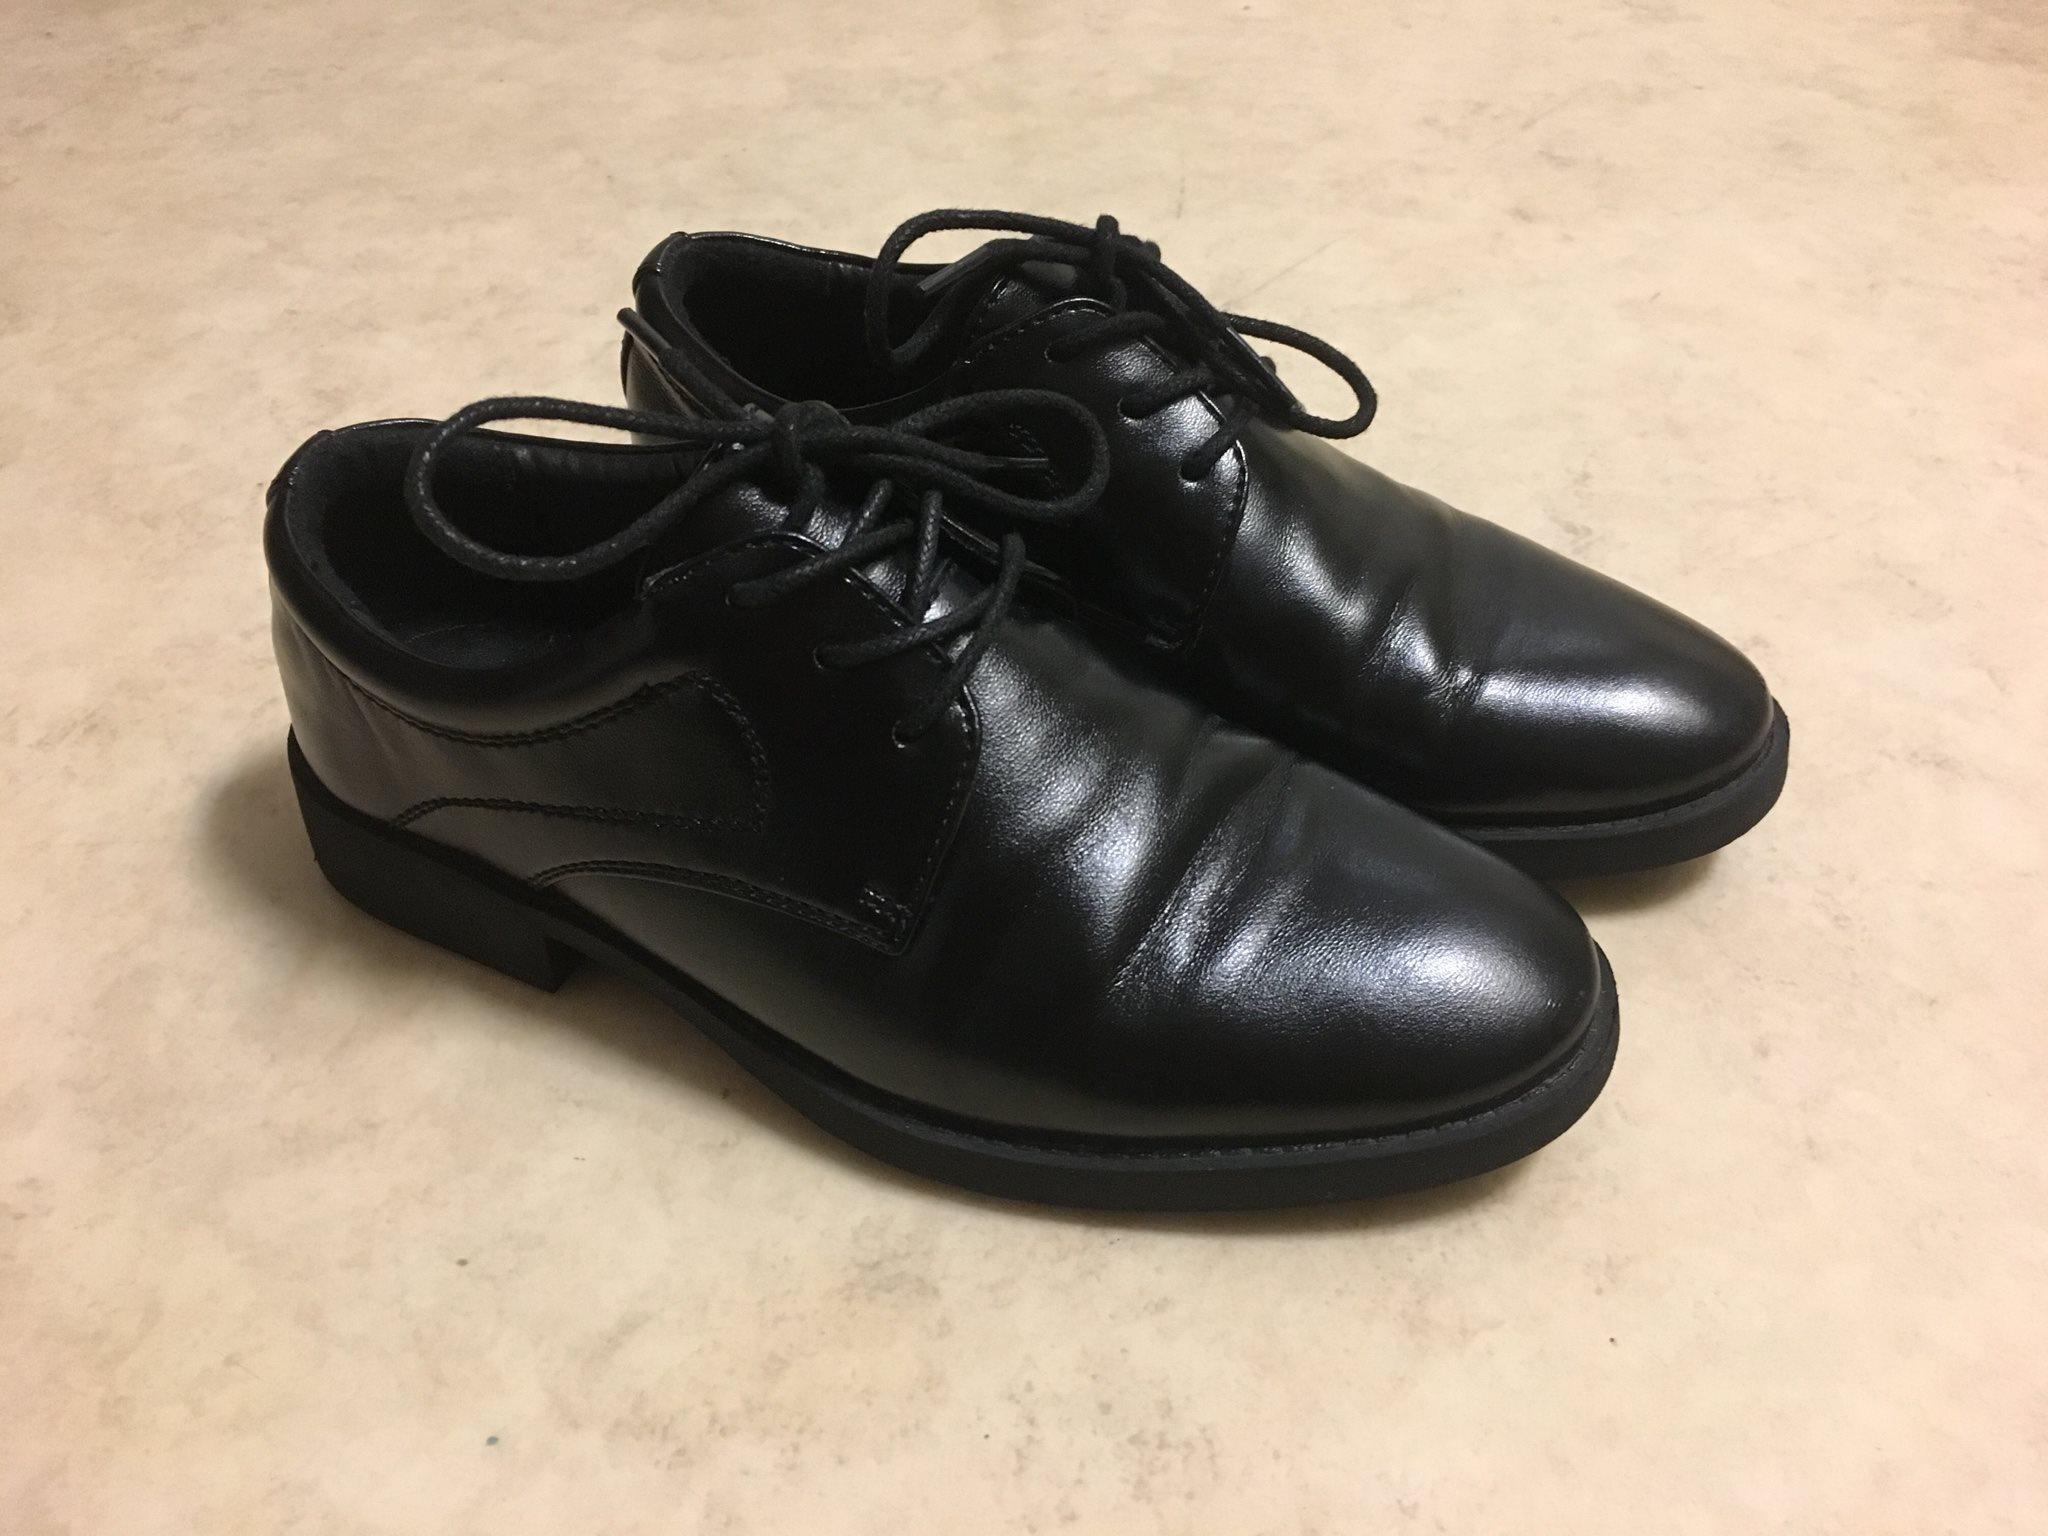 svarta skor bröllop